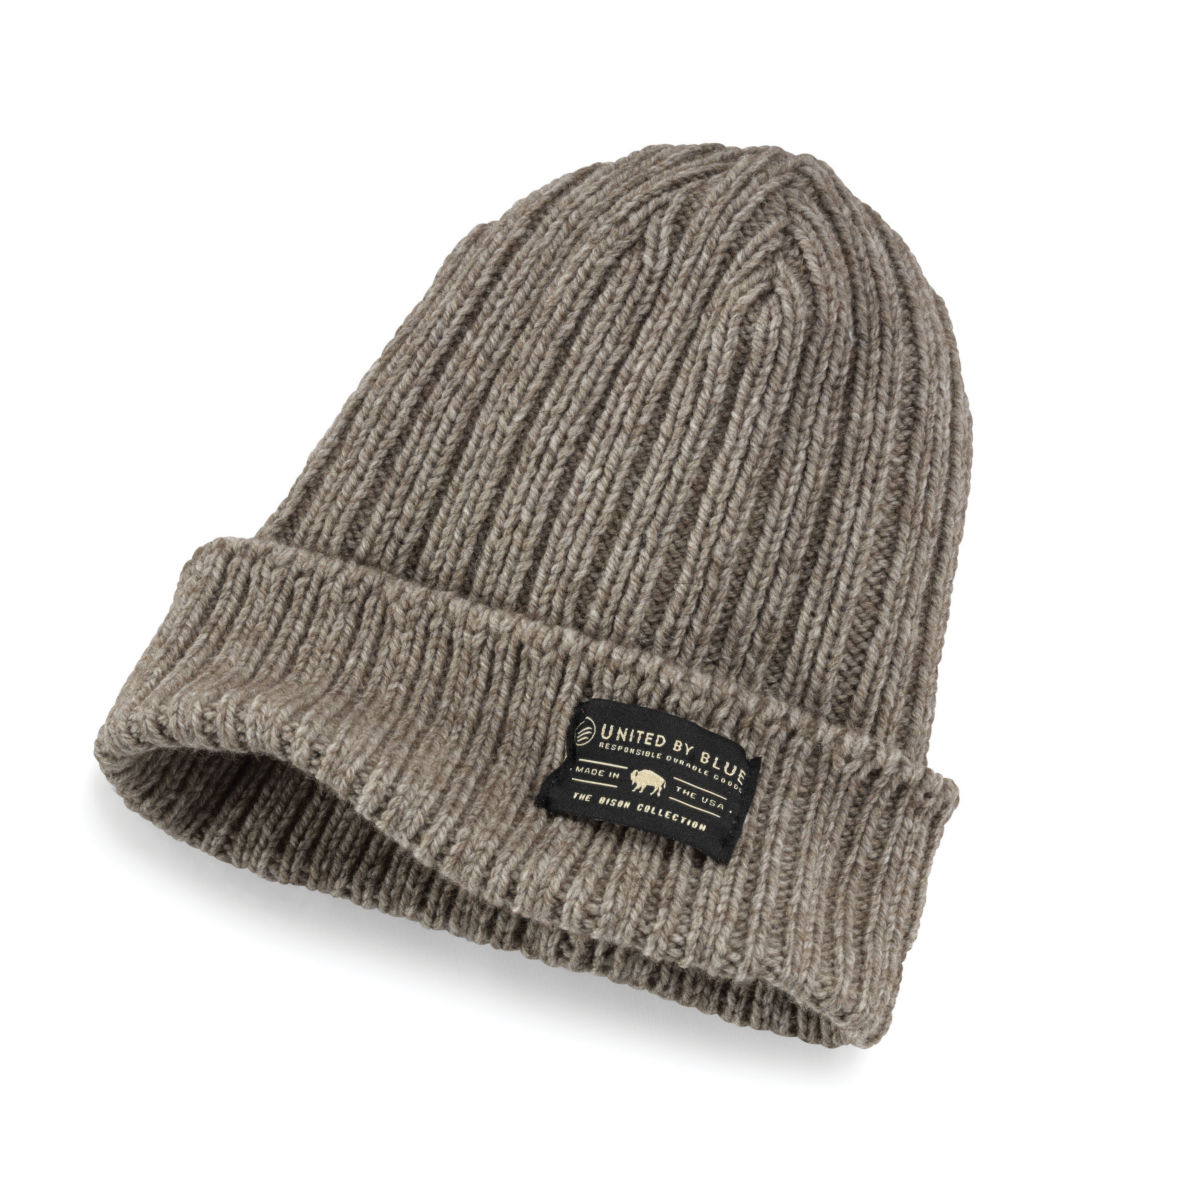 Ultimate Bison Knit Beanie - BROWNimage number 0